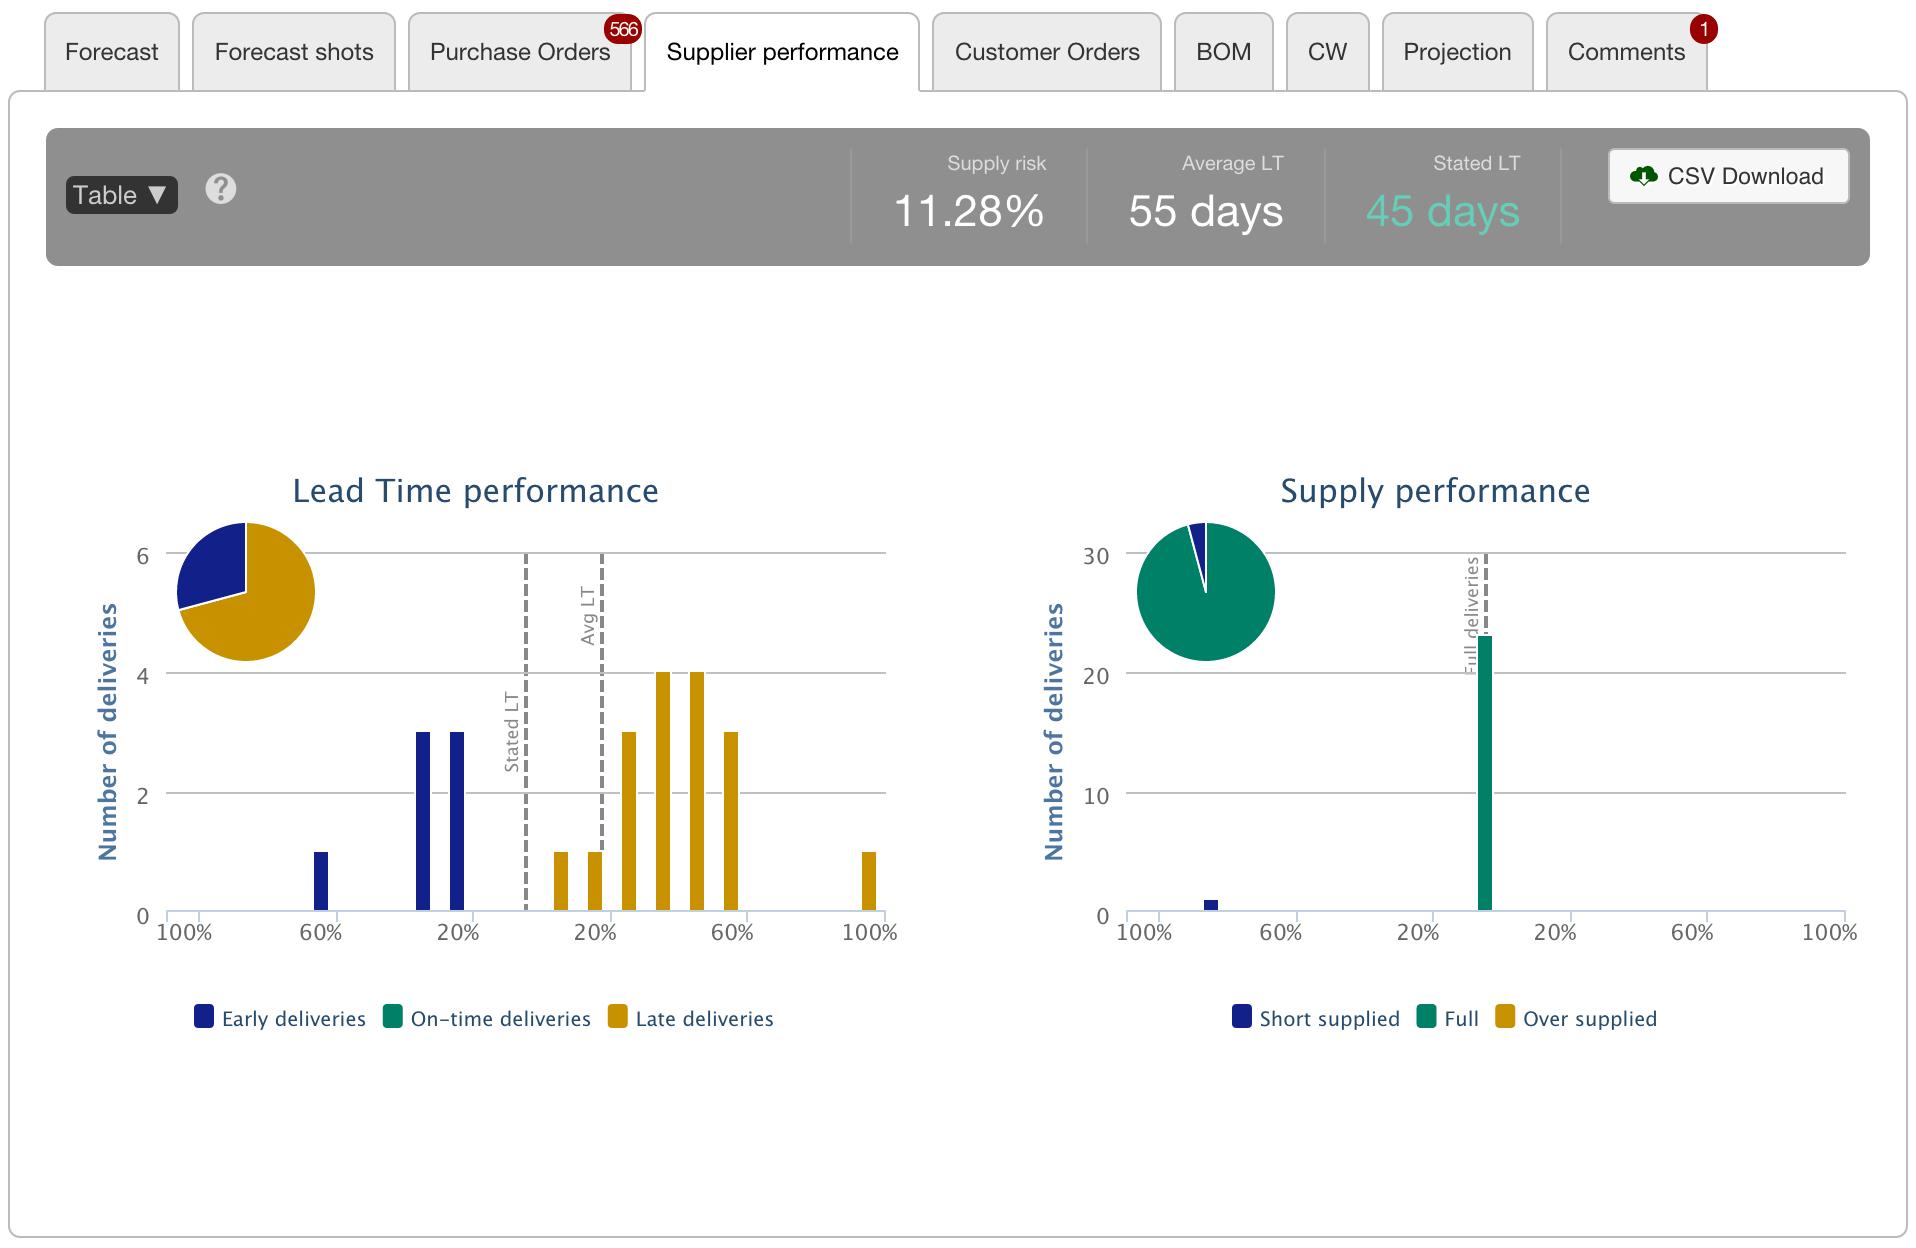 Supplier Performance